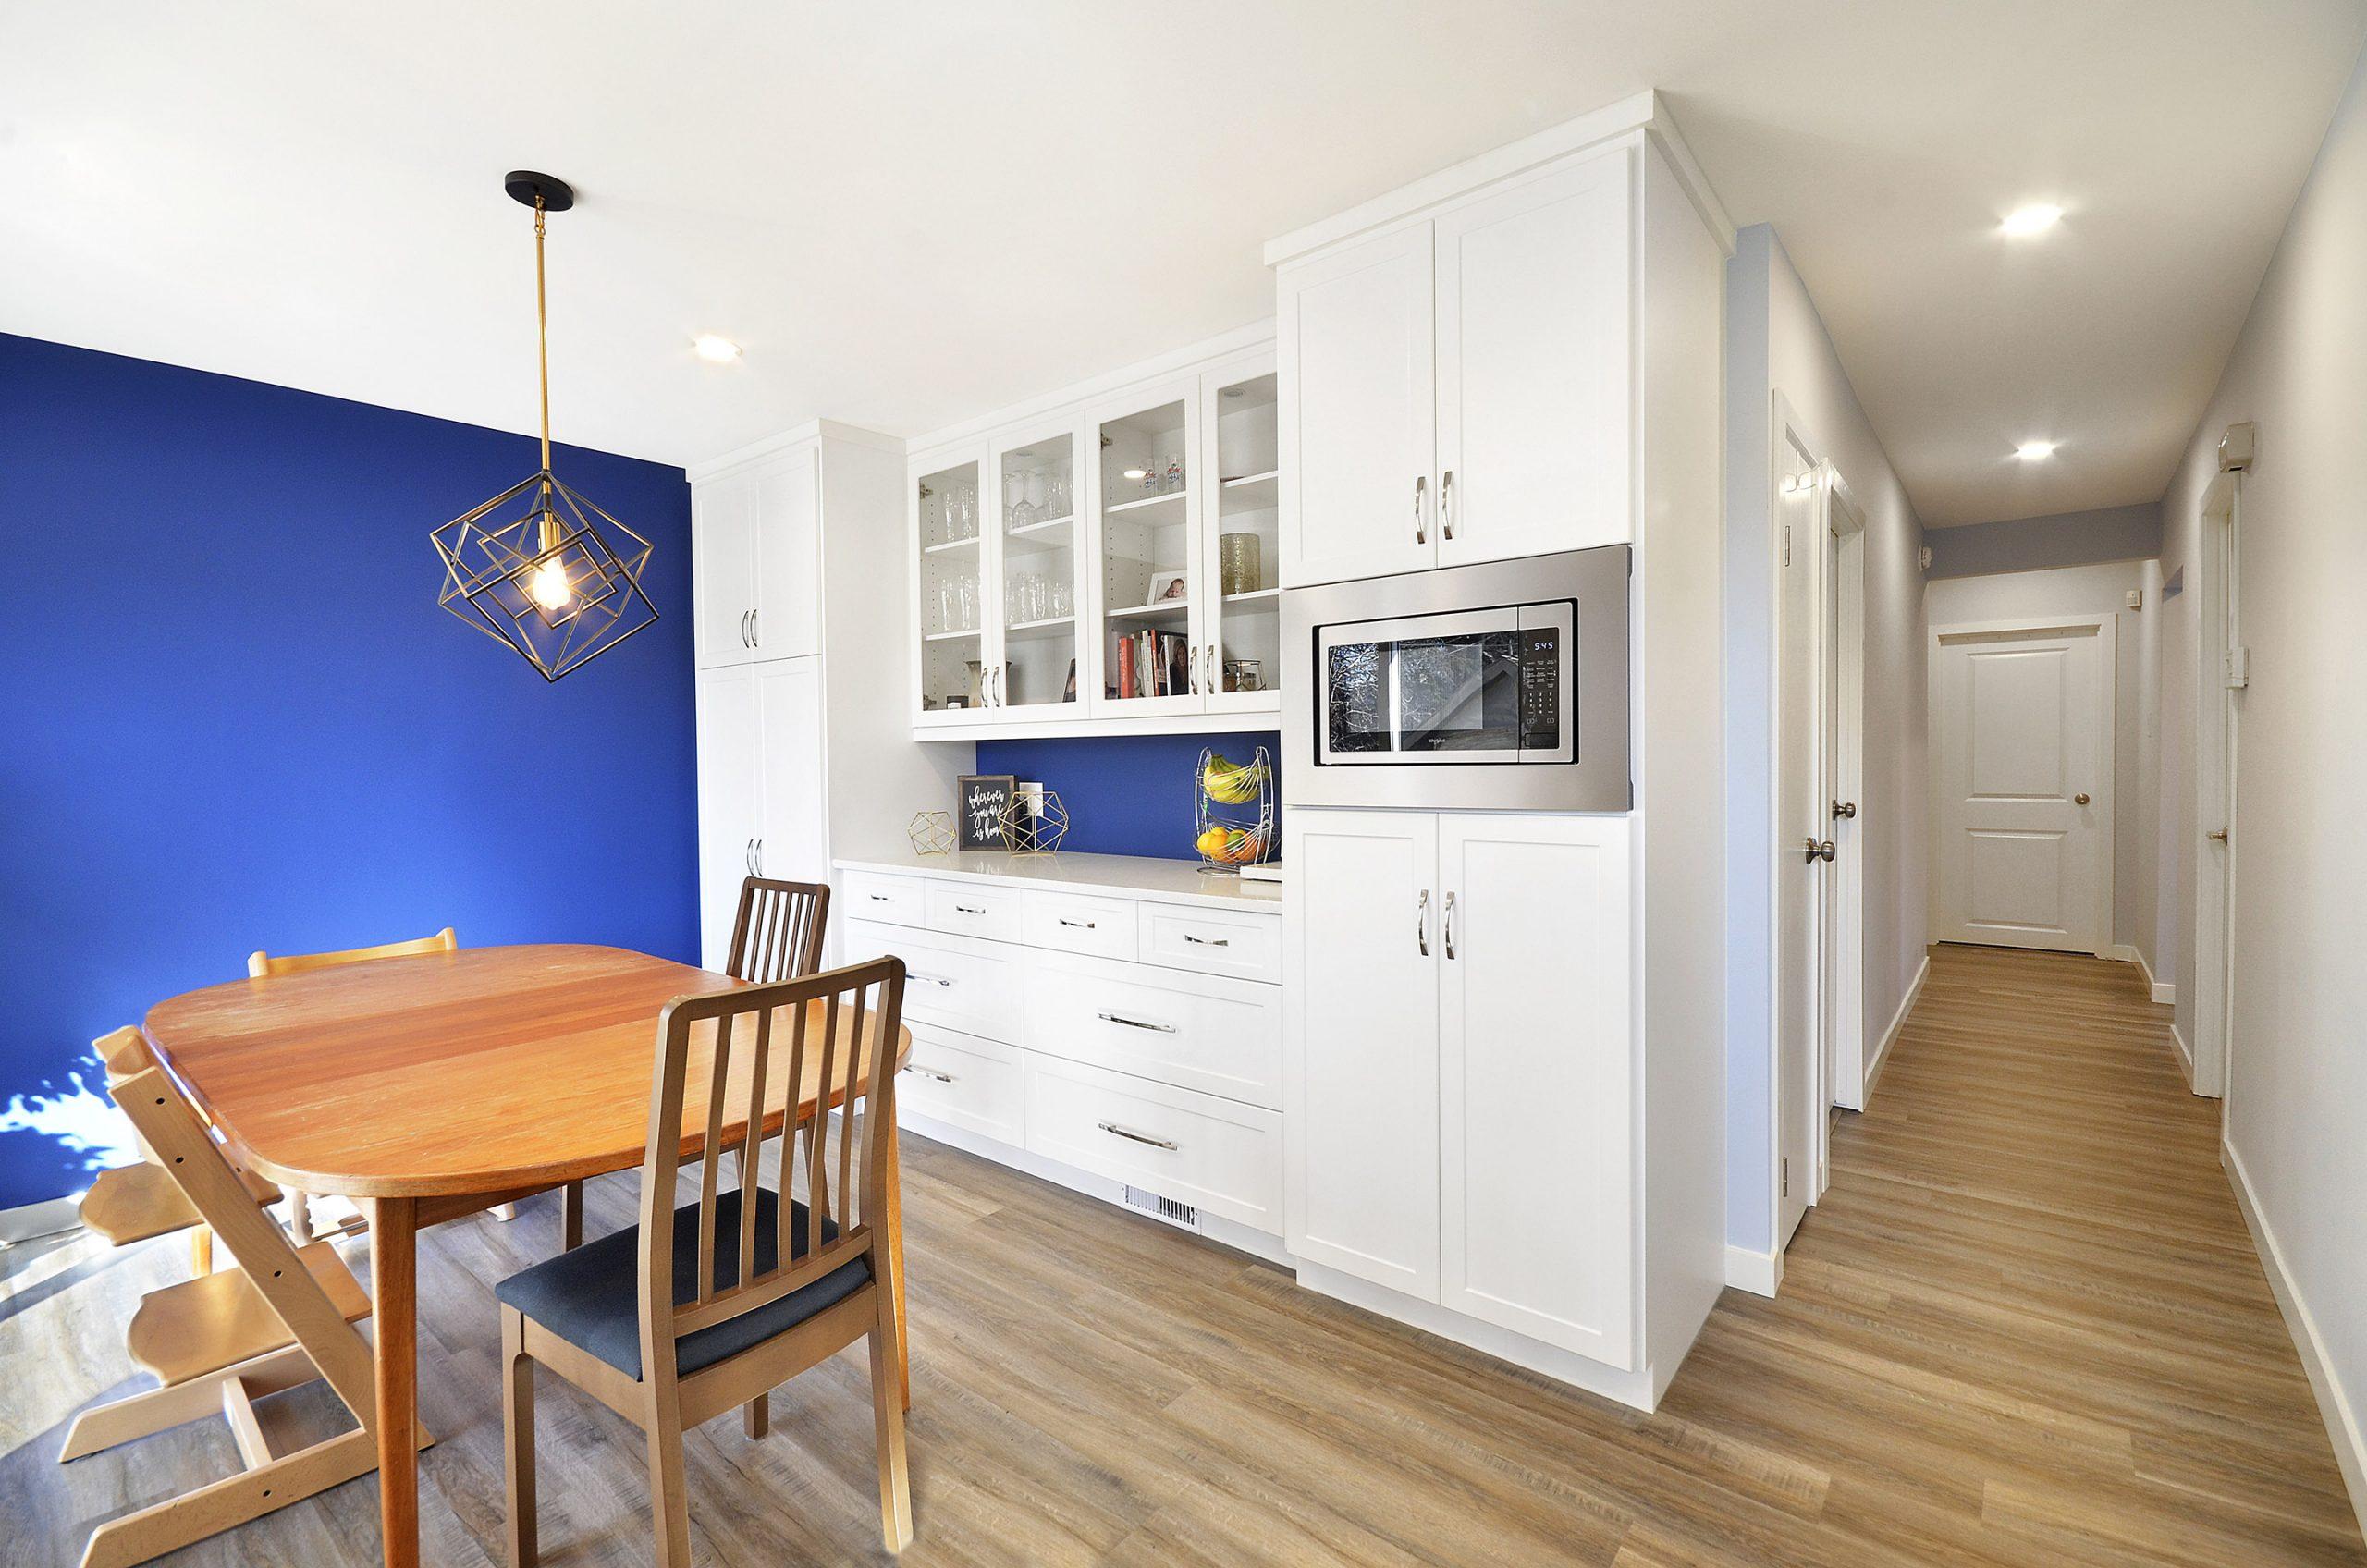 Jupiter_Winnipeg kitchen opn concept